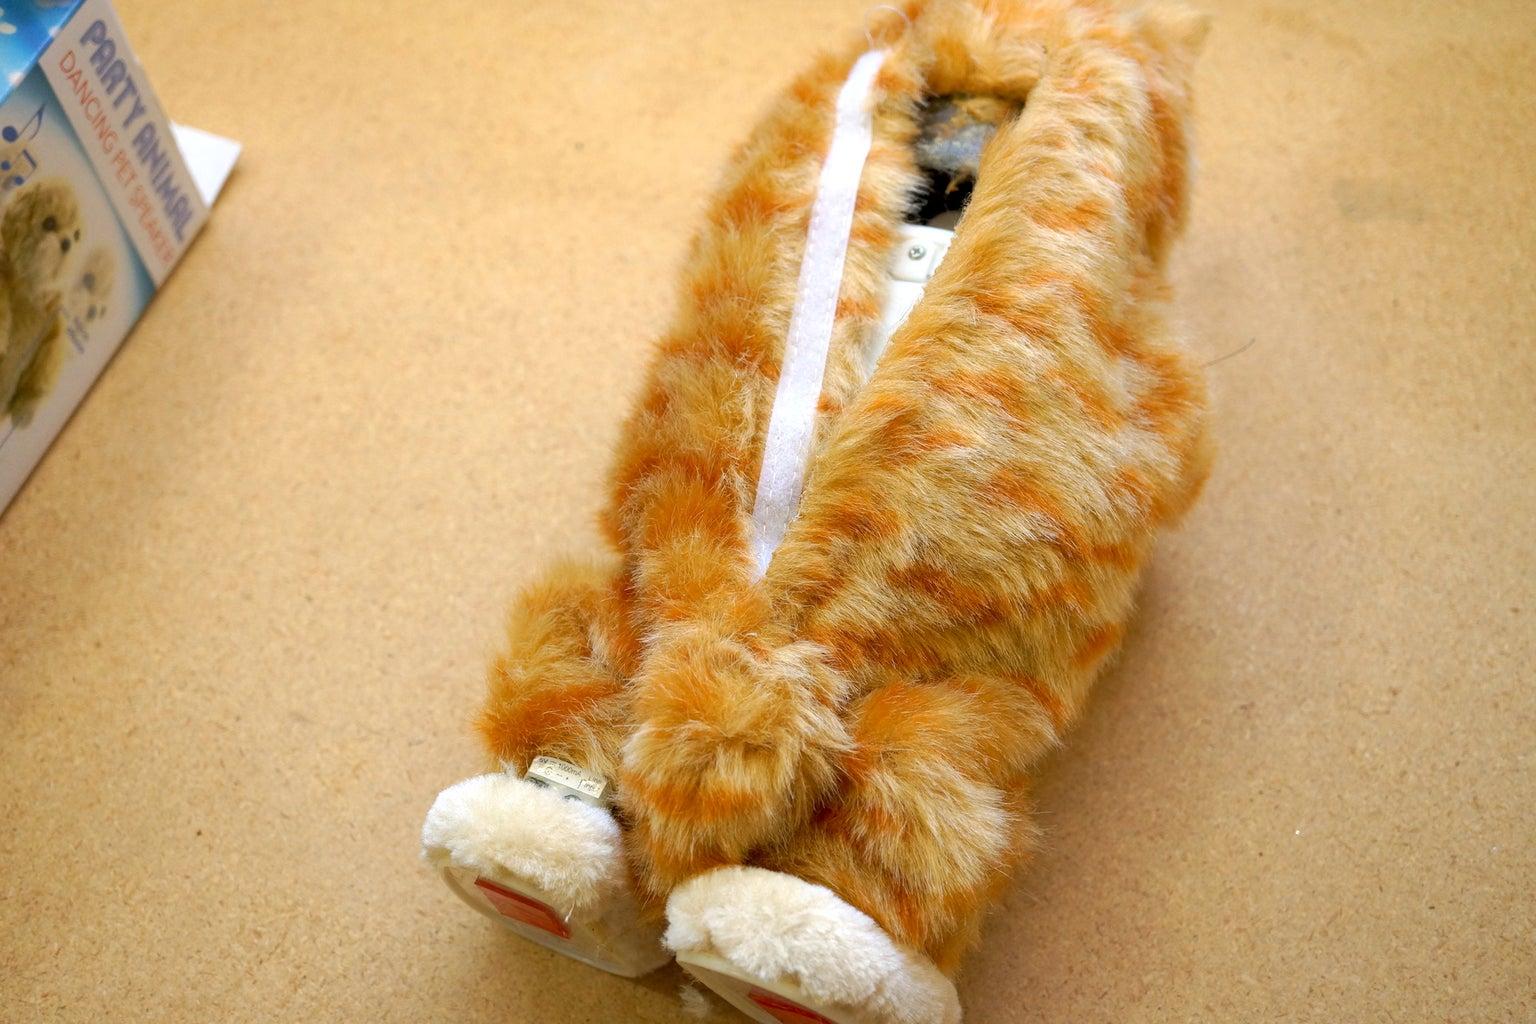 Strip the Cat